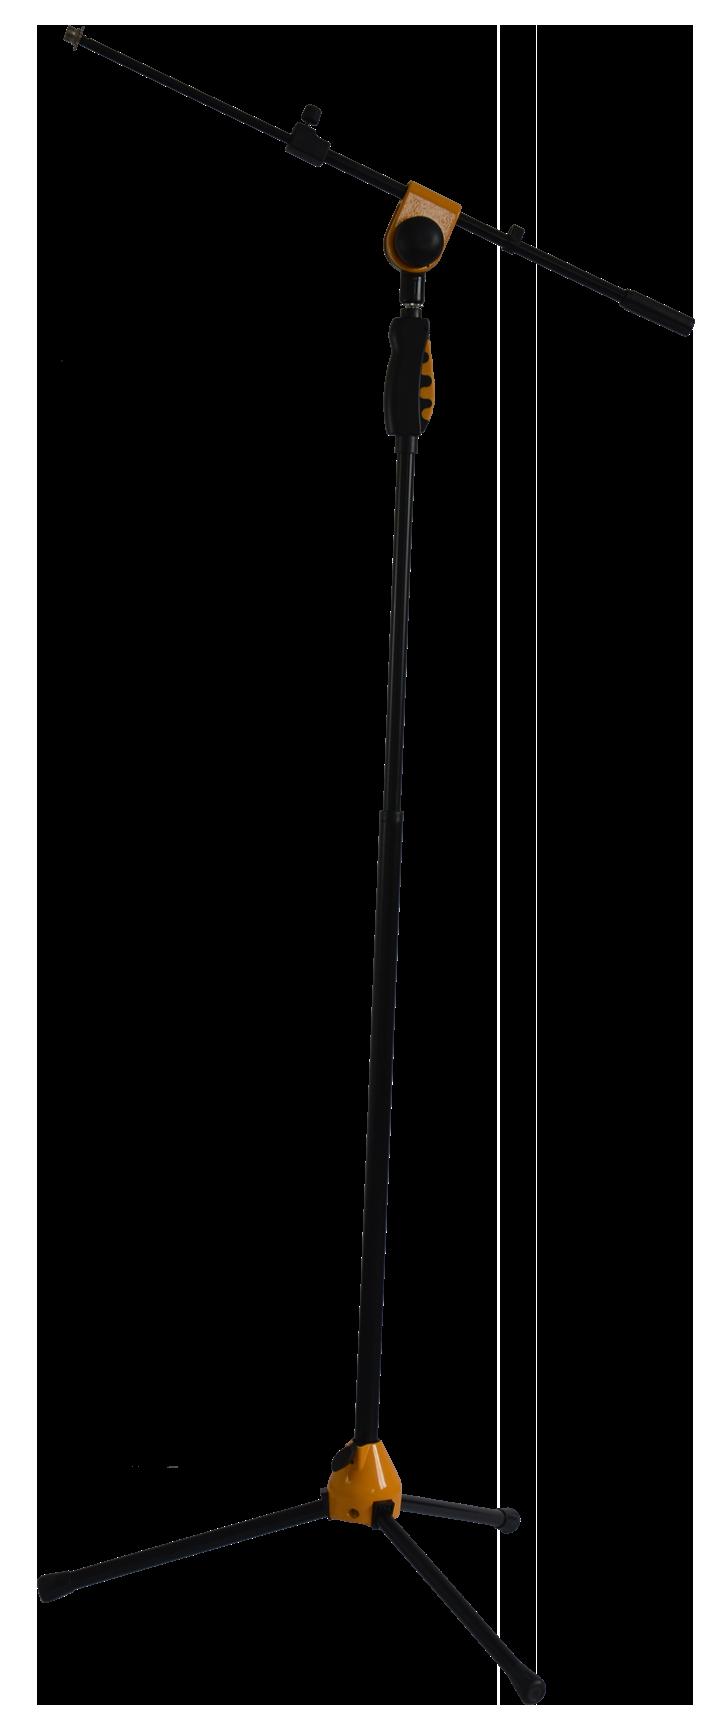 Billede af Ibiza Mikrofon Stativ, Teleskop, 115-170 cm Gul